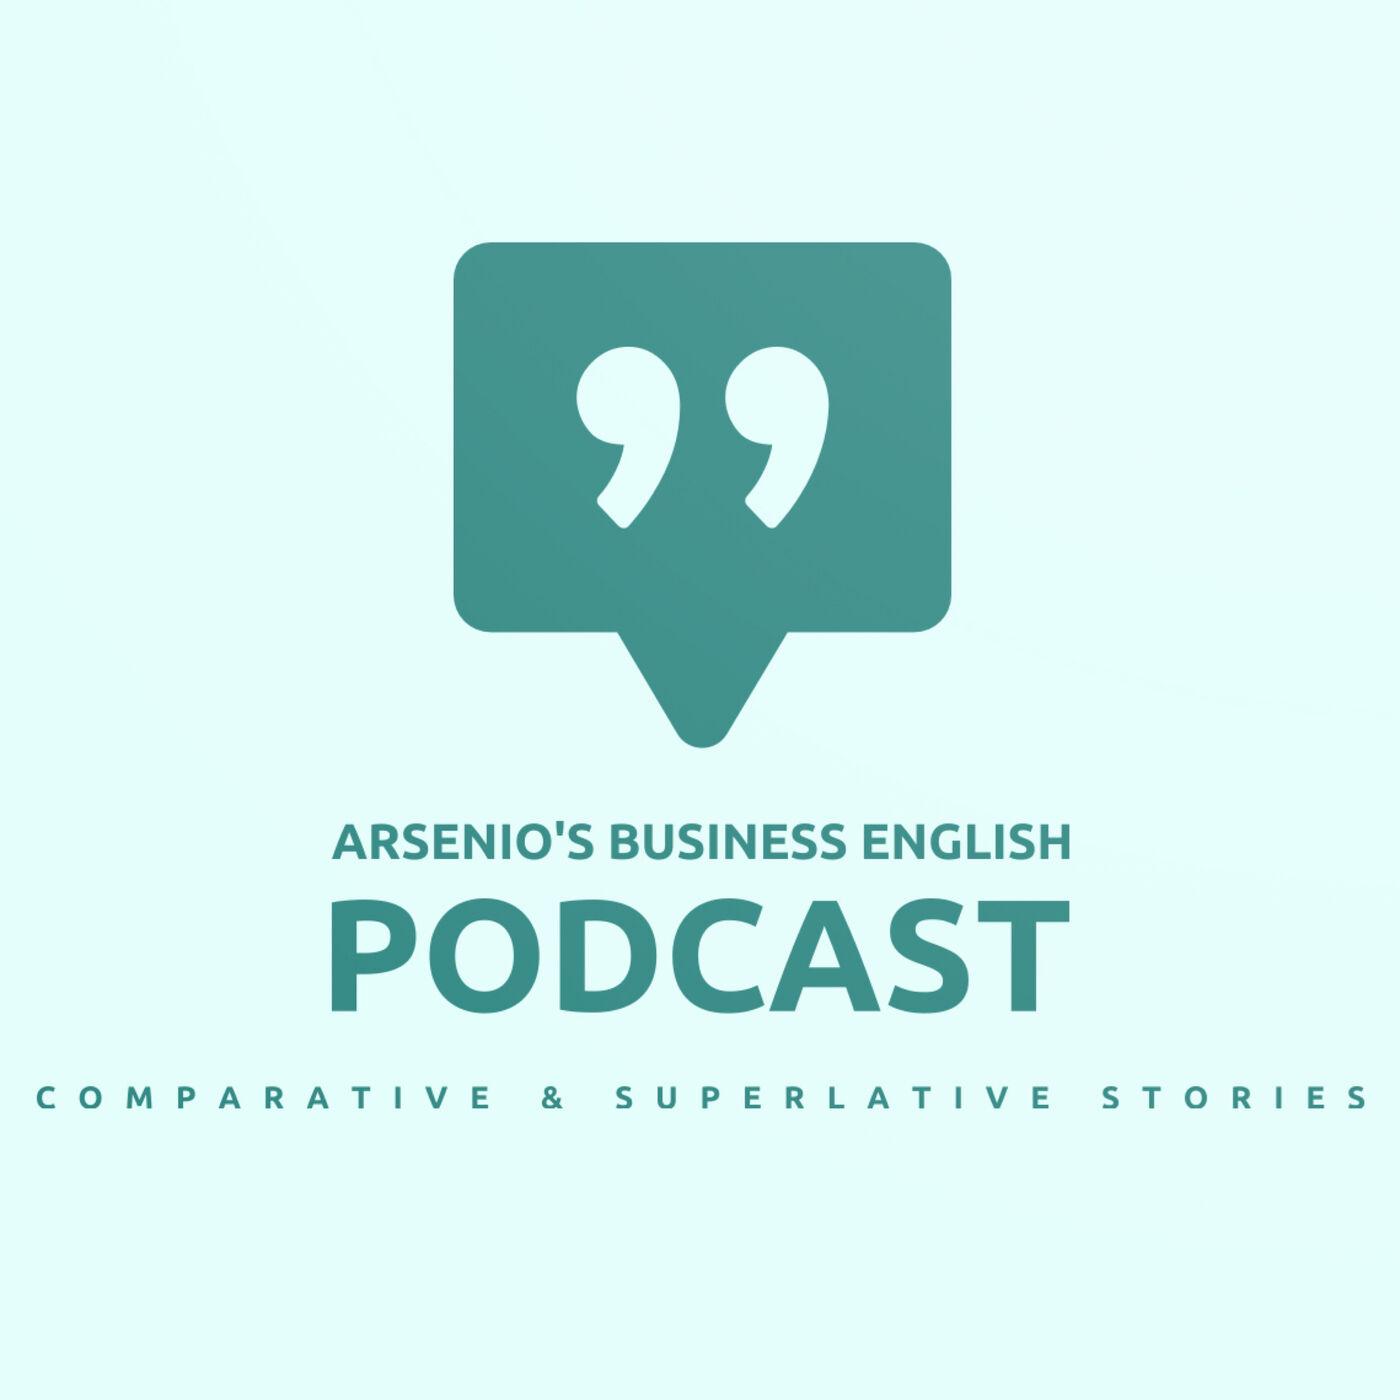 Arsenio's Business English Podcast   Season 6: Episode 23   Grammar: Comparative & Superlative Moments